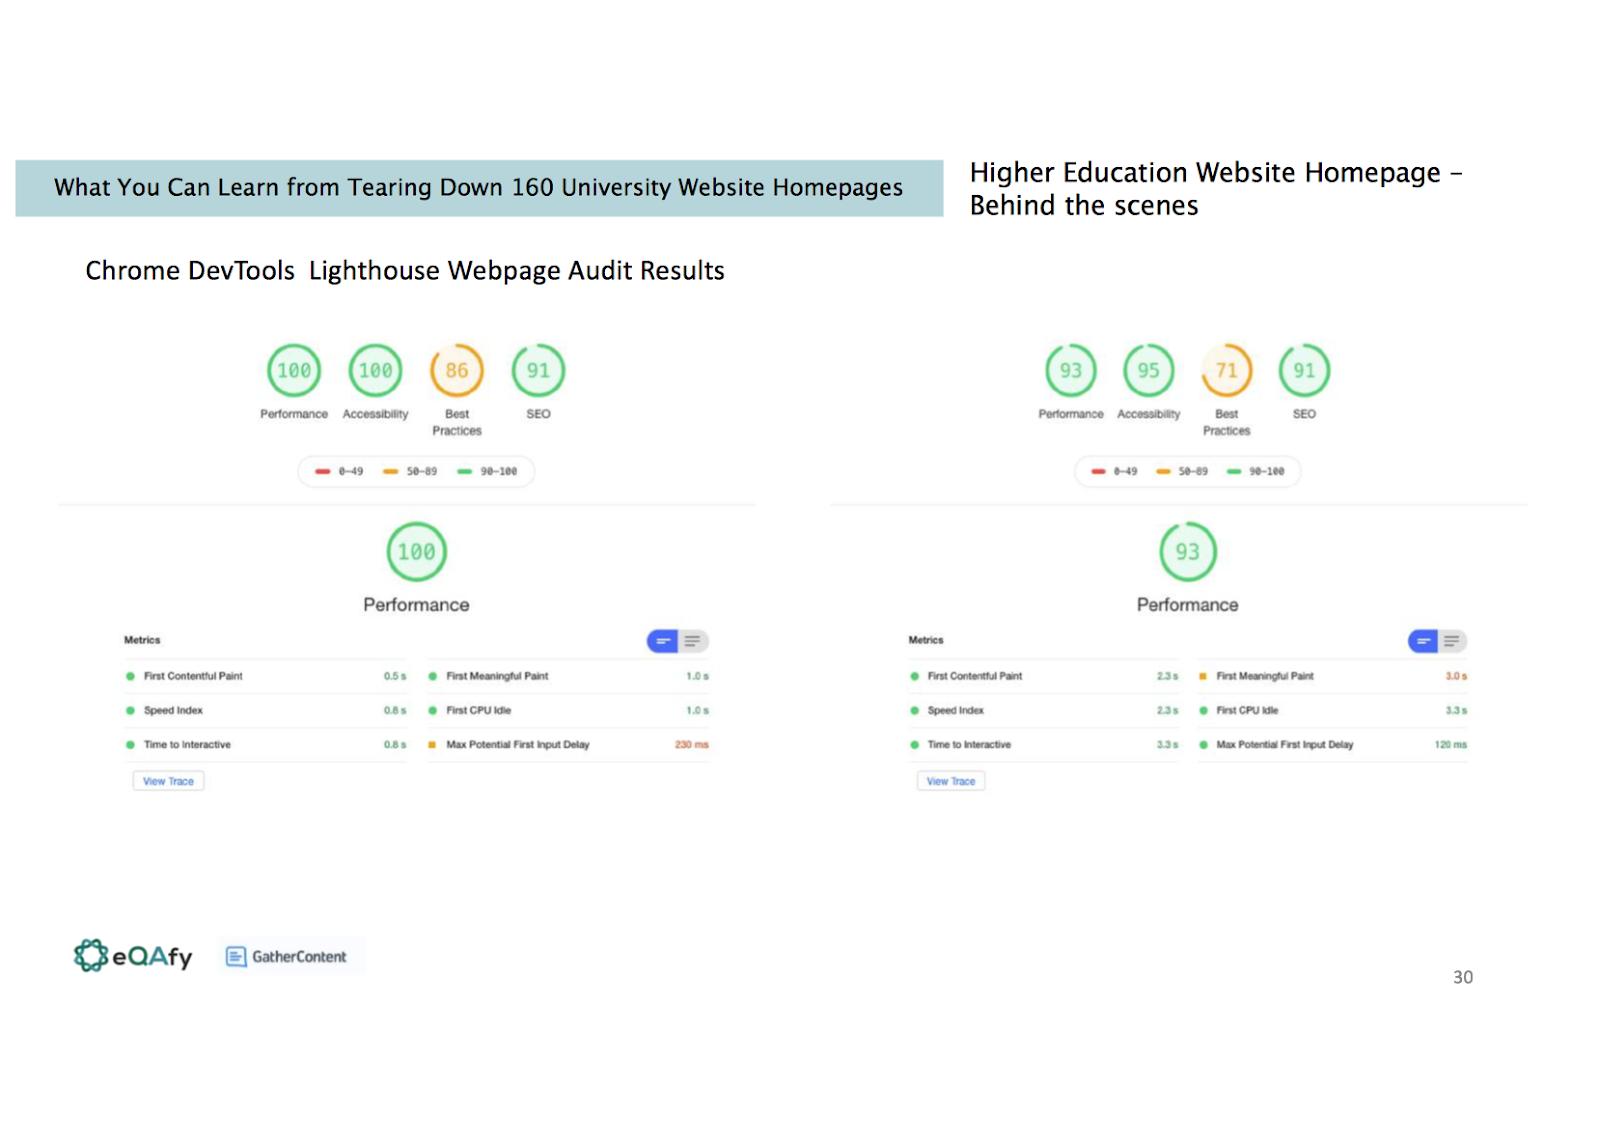 Slide shows Chrome DevTools Lighthouse Webpage Audit results page